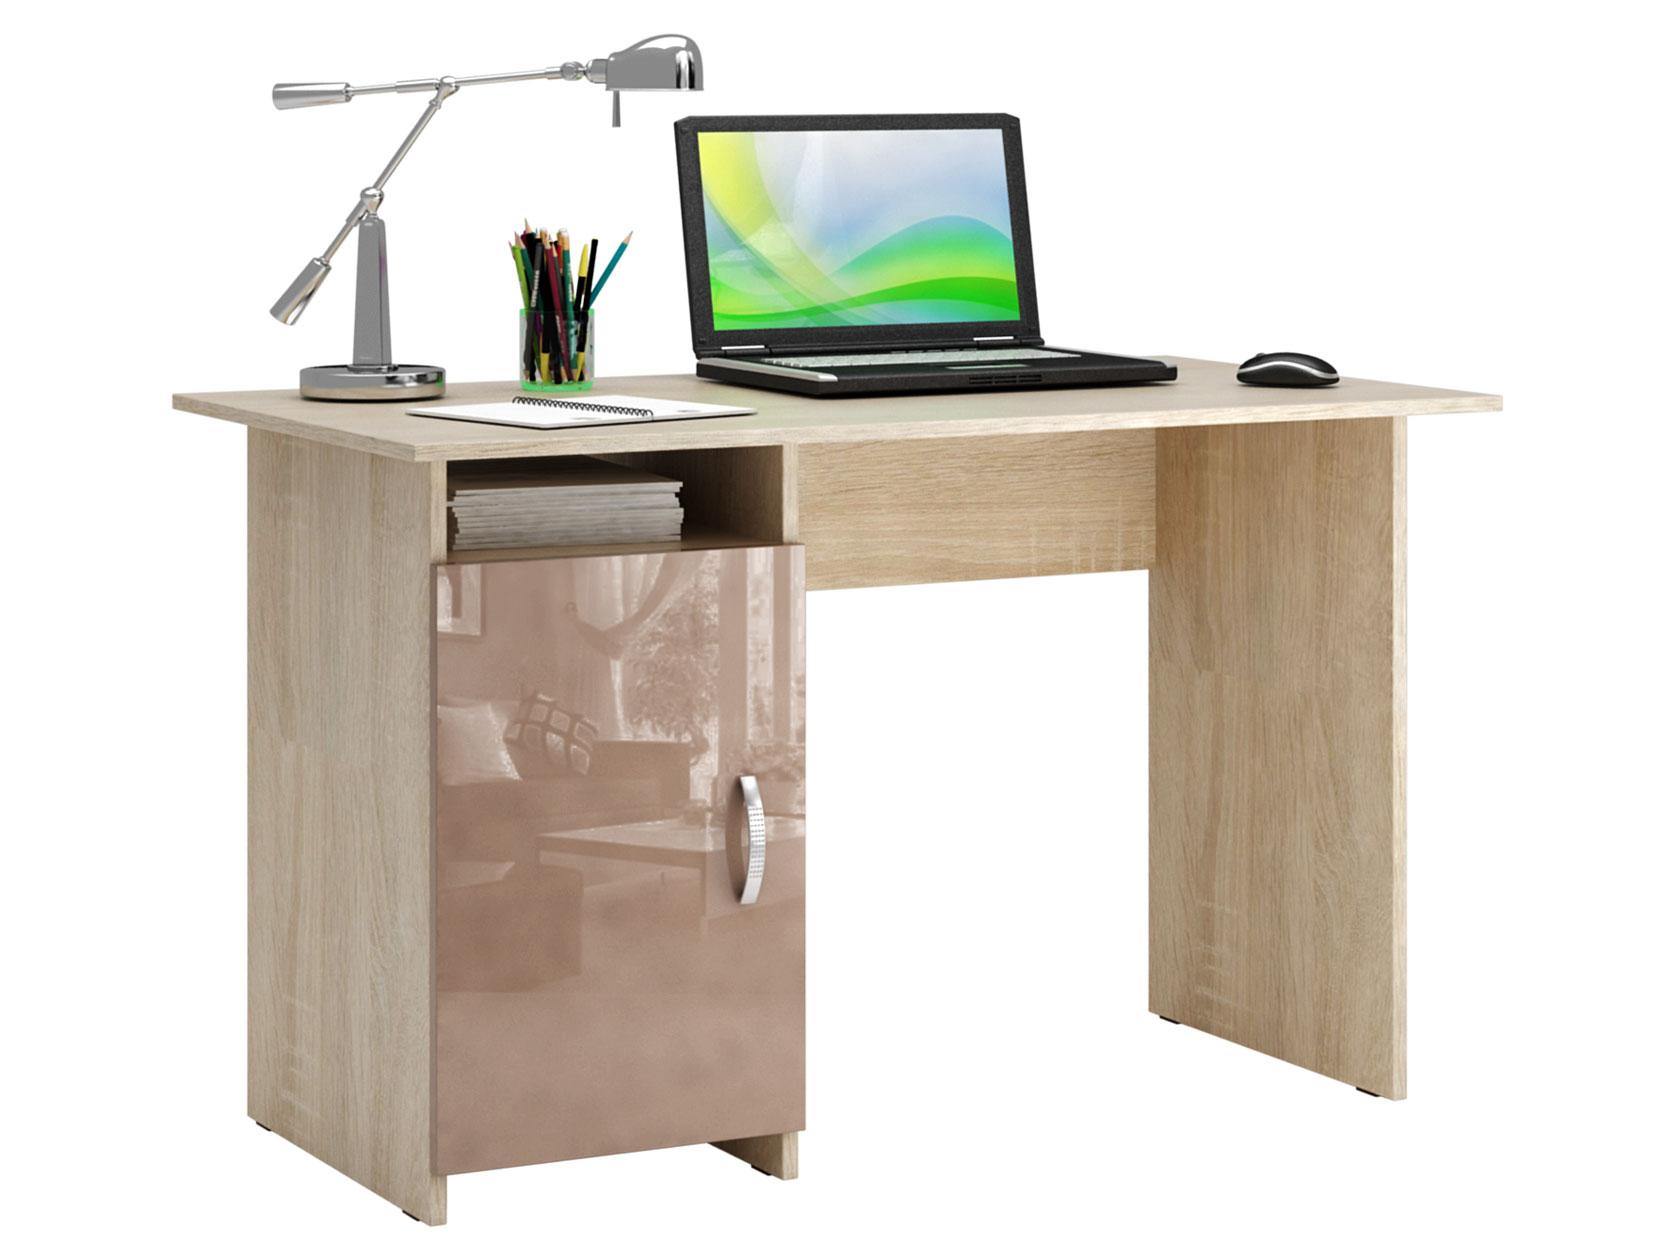 Письменный стол МФ Мастер МСТ-СДМ-08-ГЛ Милан-8 глянец дуб сонома, капучино глянец